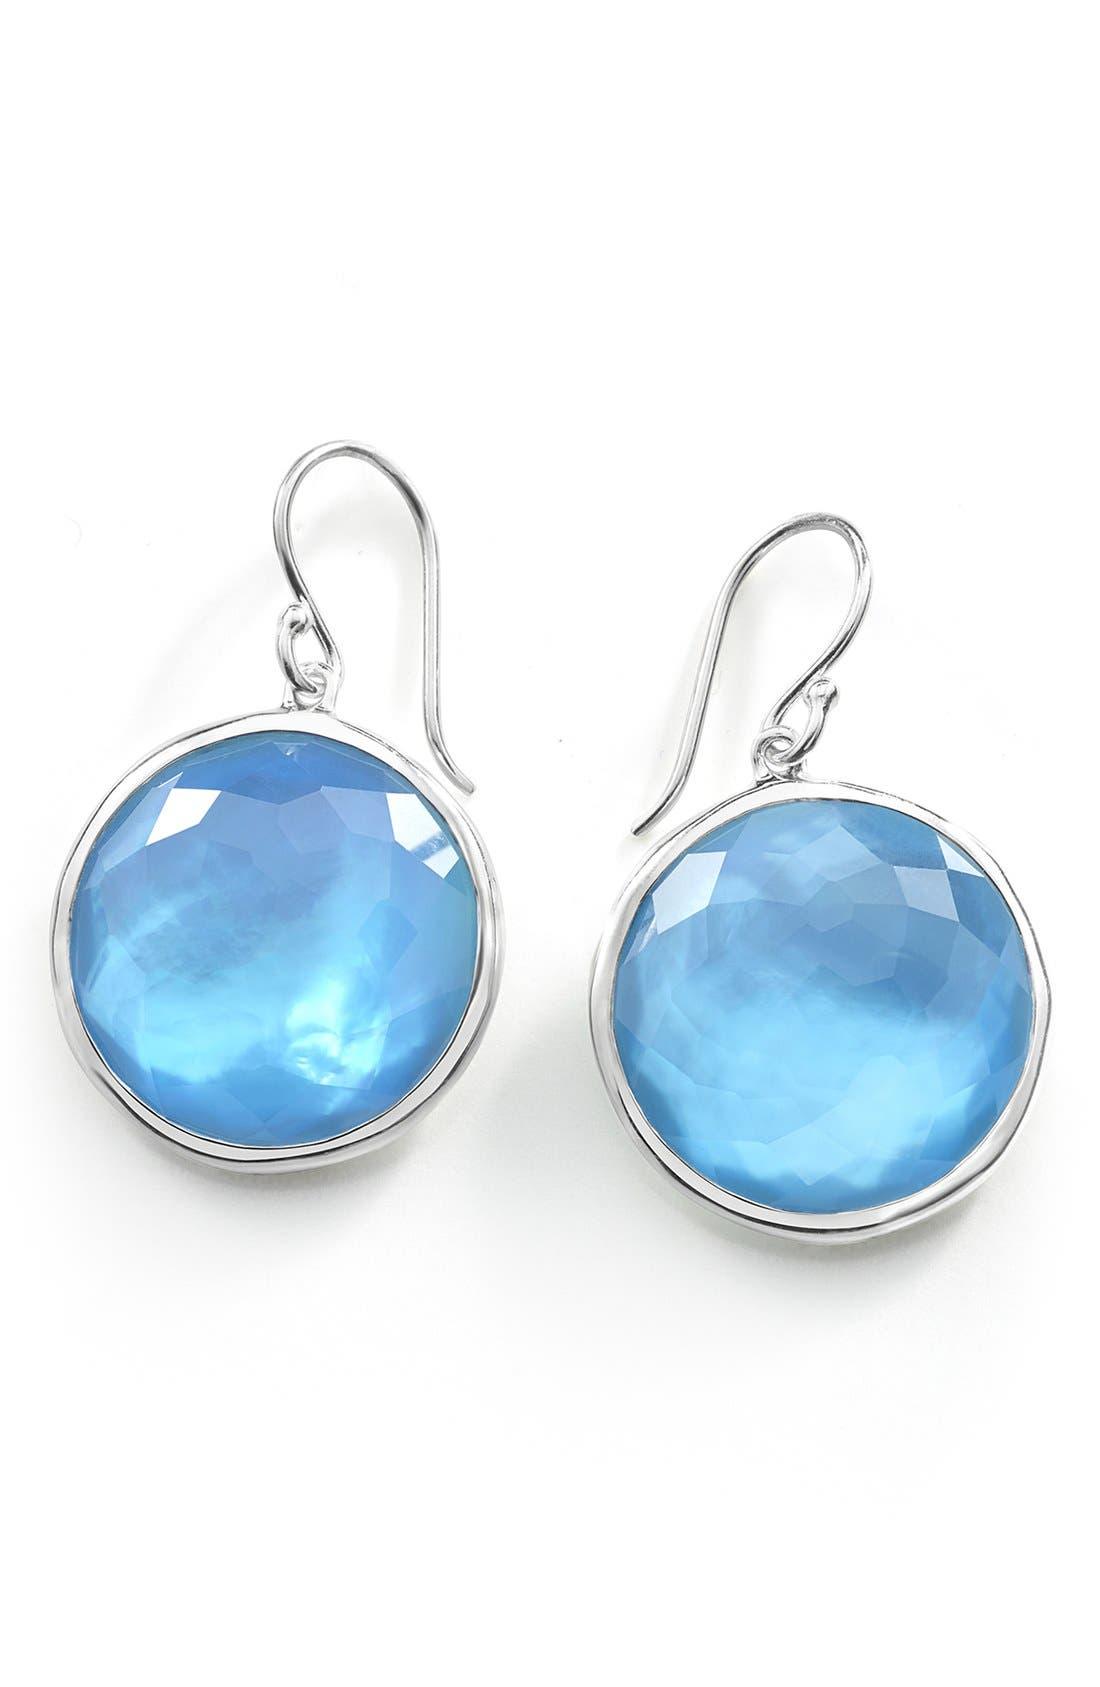 Alternate Image 1 Selected - Ippolita 'Rock Candy' Large Stone Drop Earrings